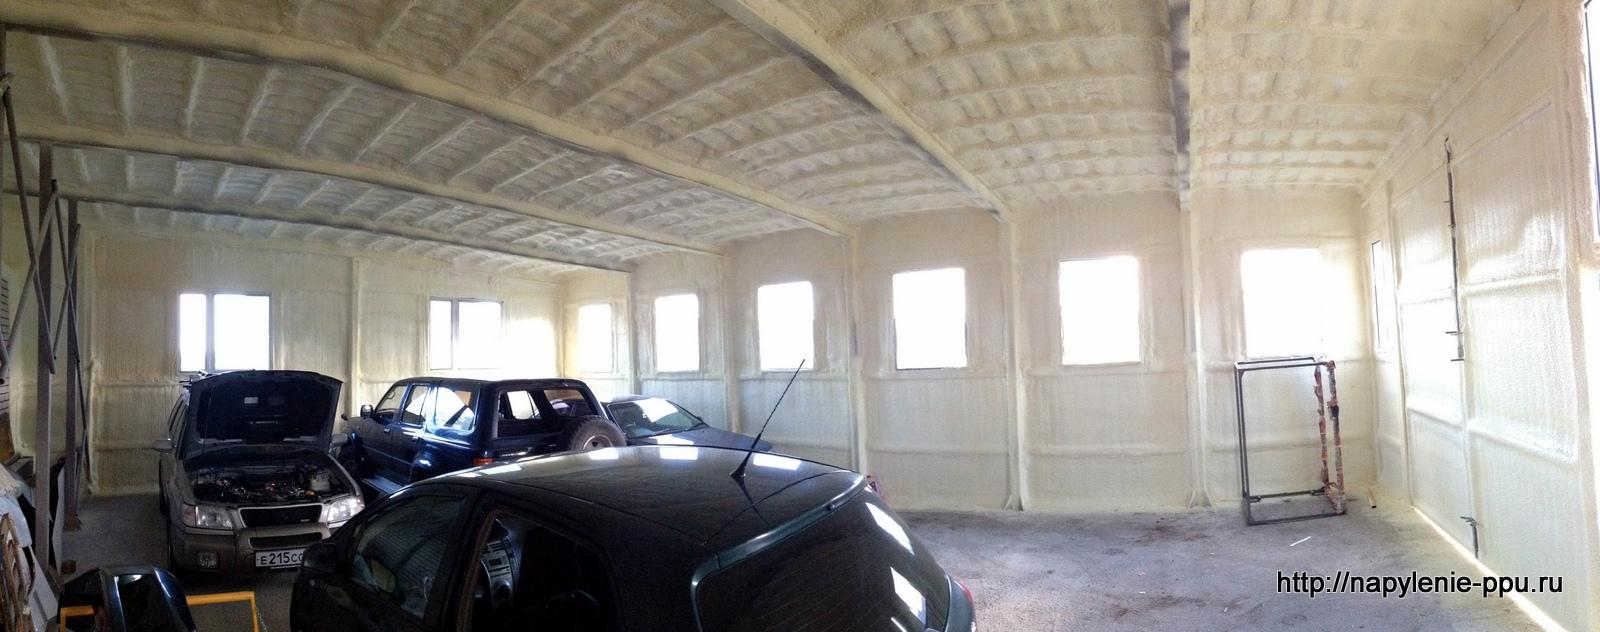 Теплоизоляция гаража! Экономия 70% тепла!